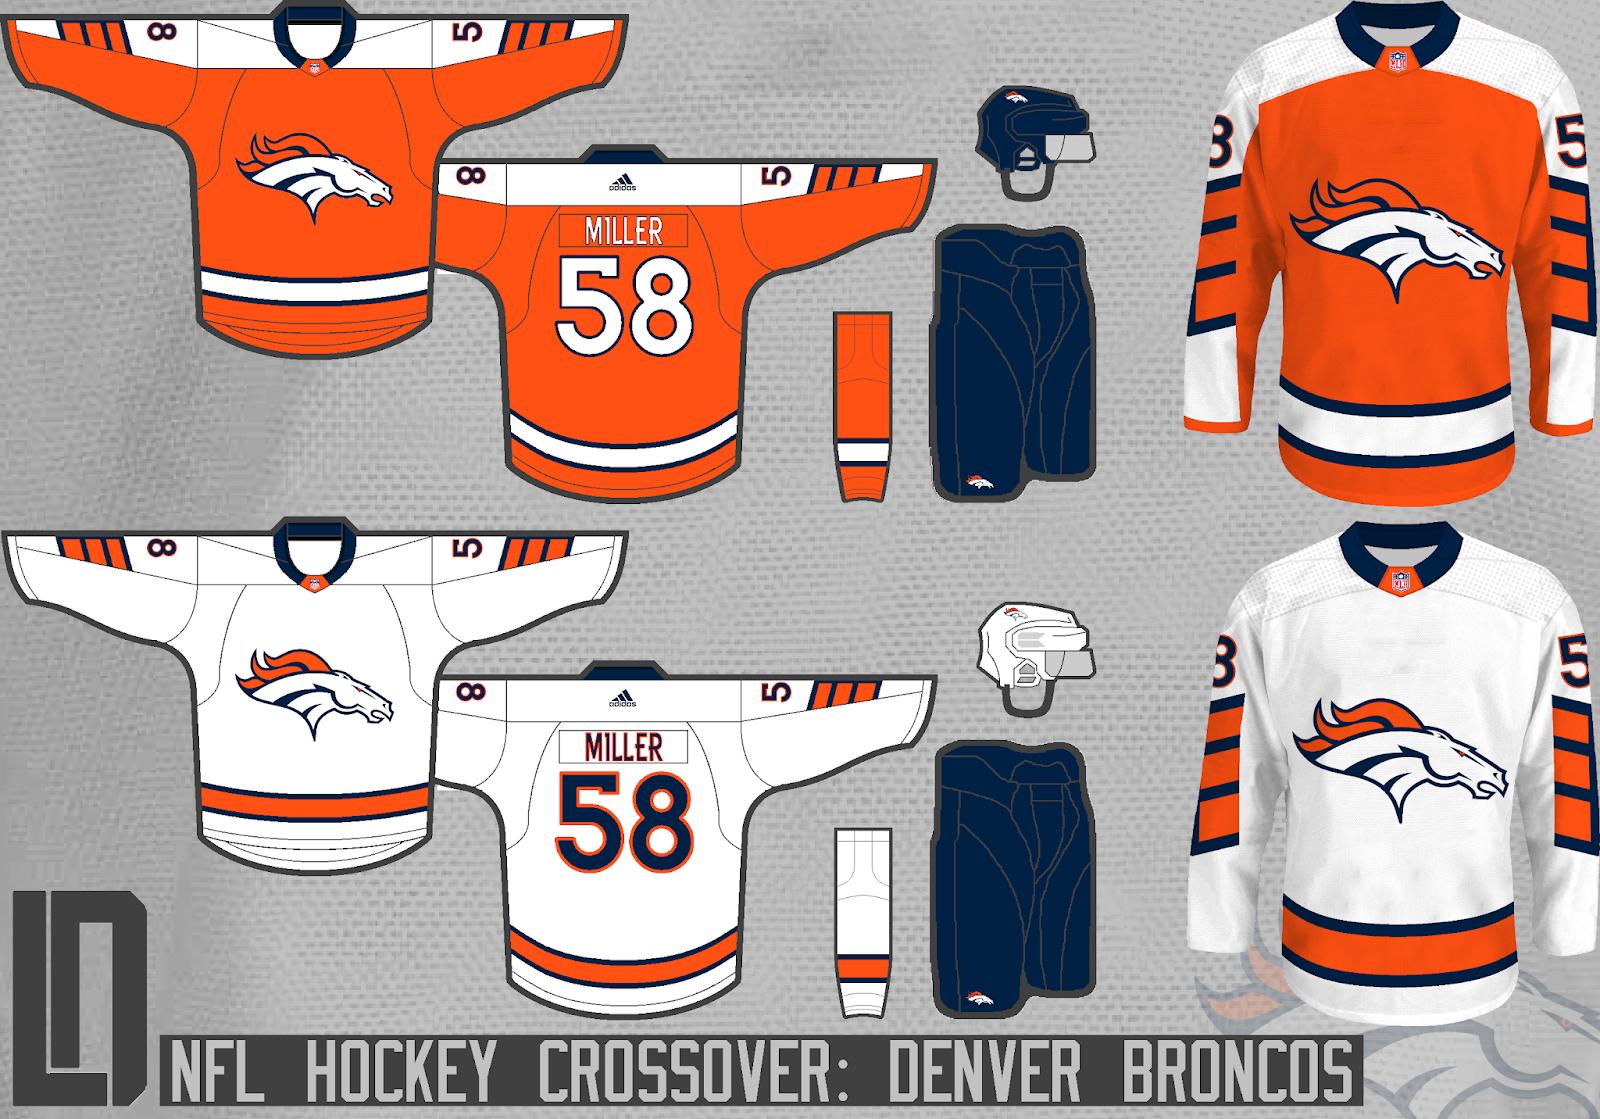 Denver+Broncos+Concept.png